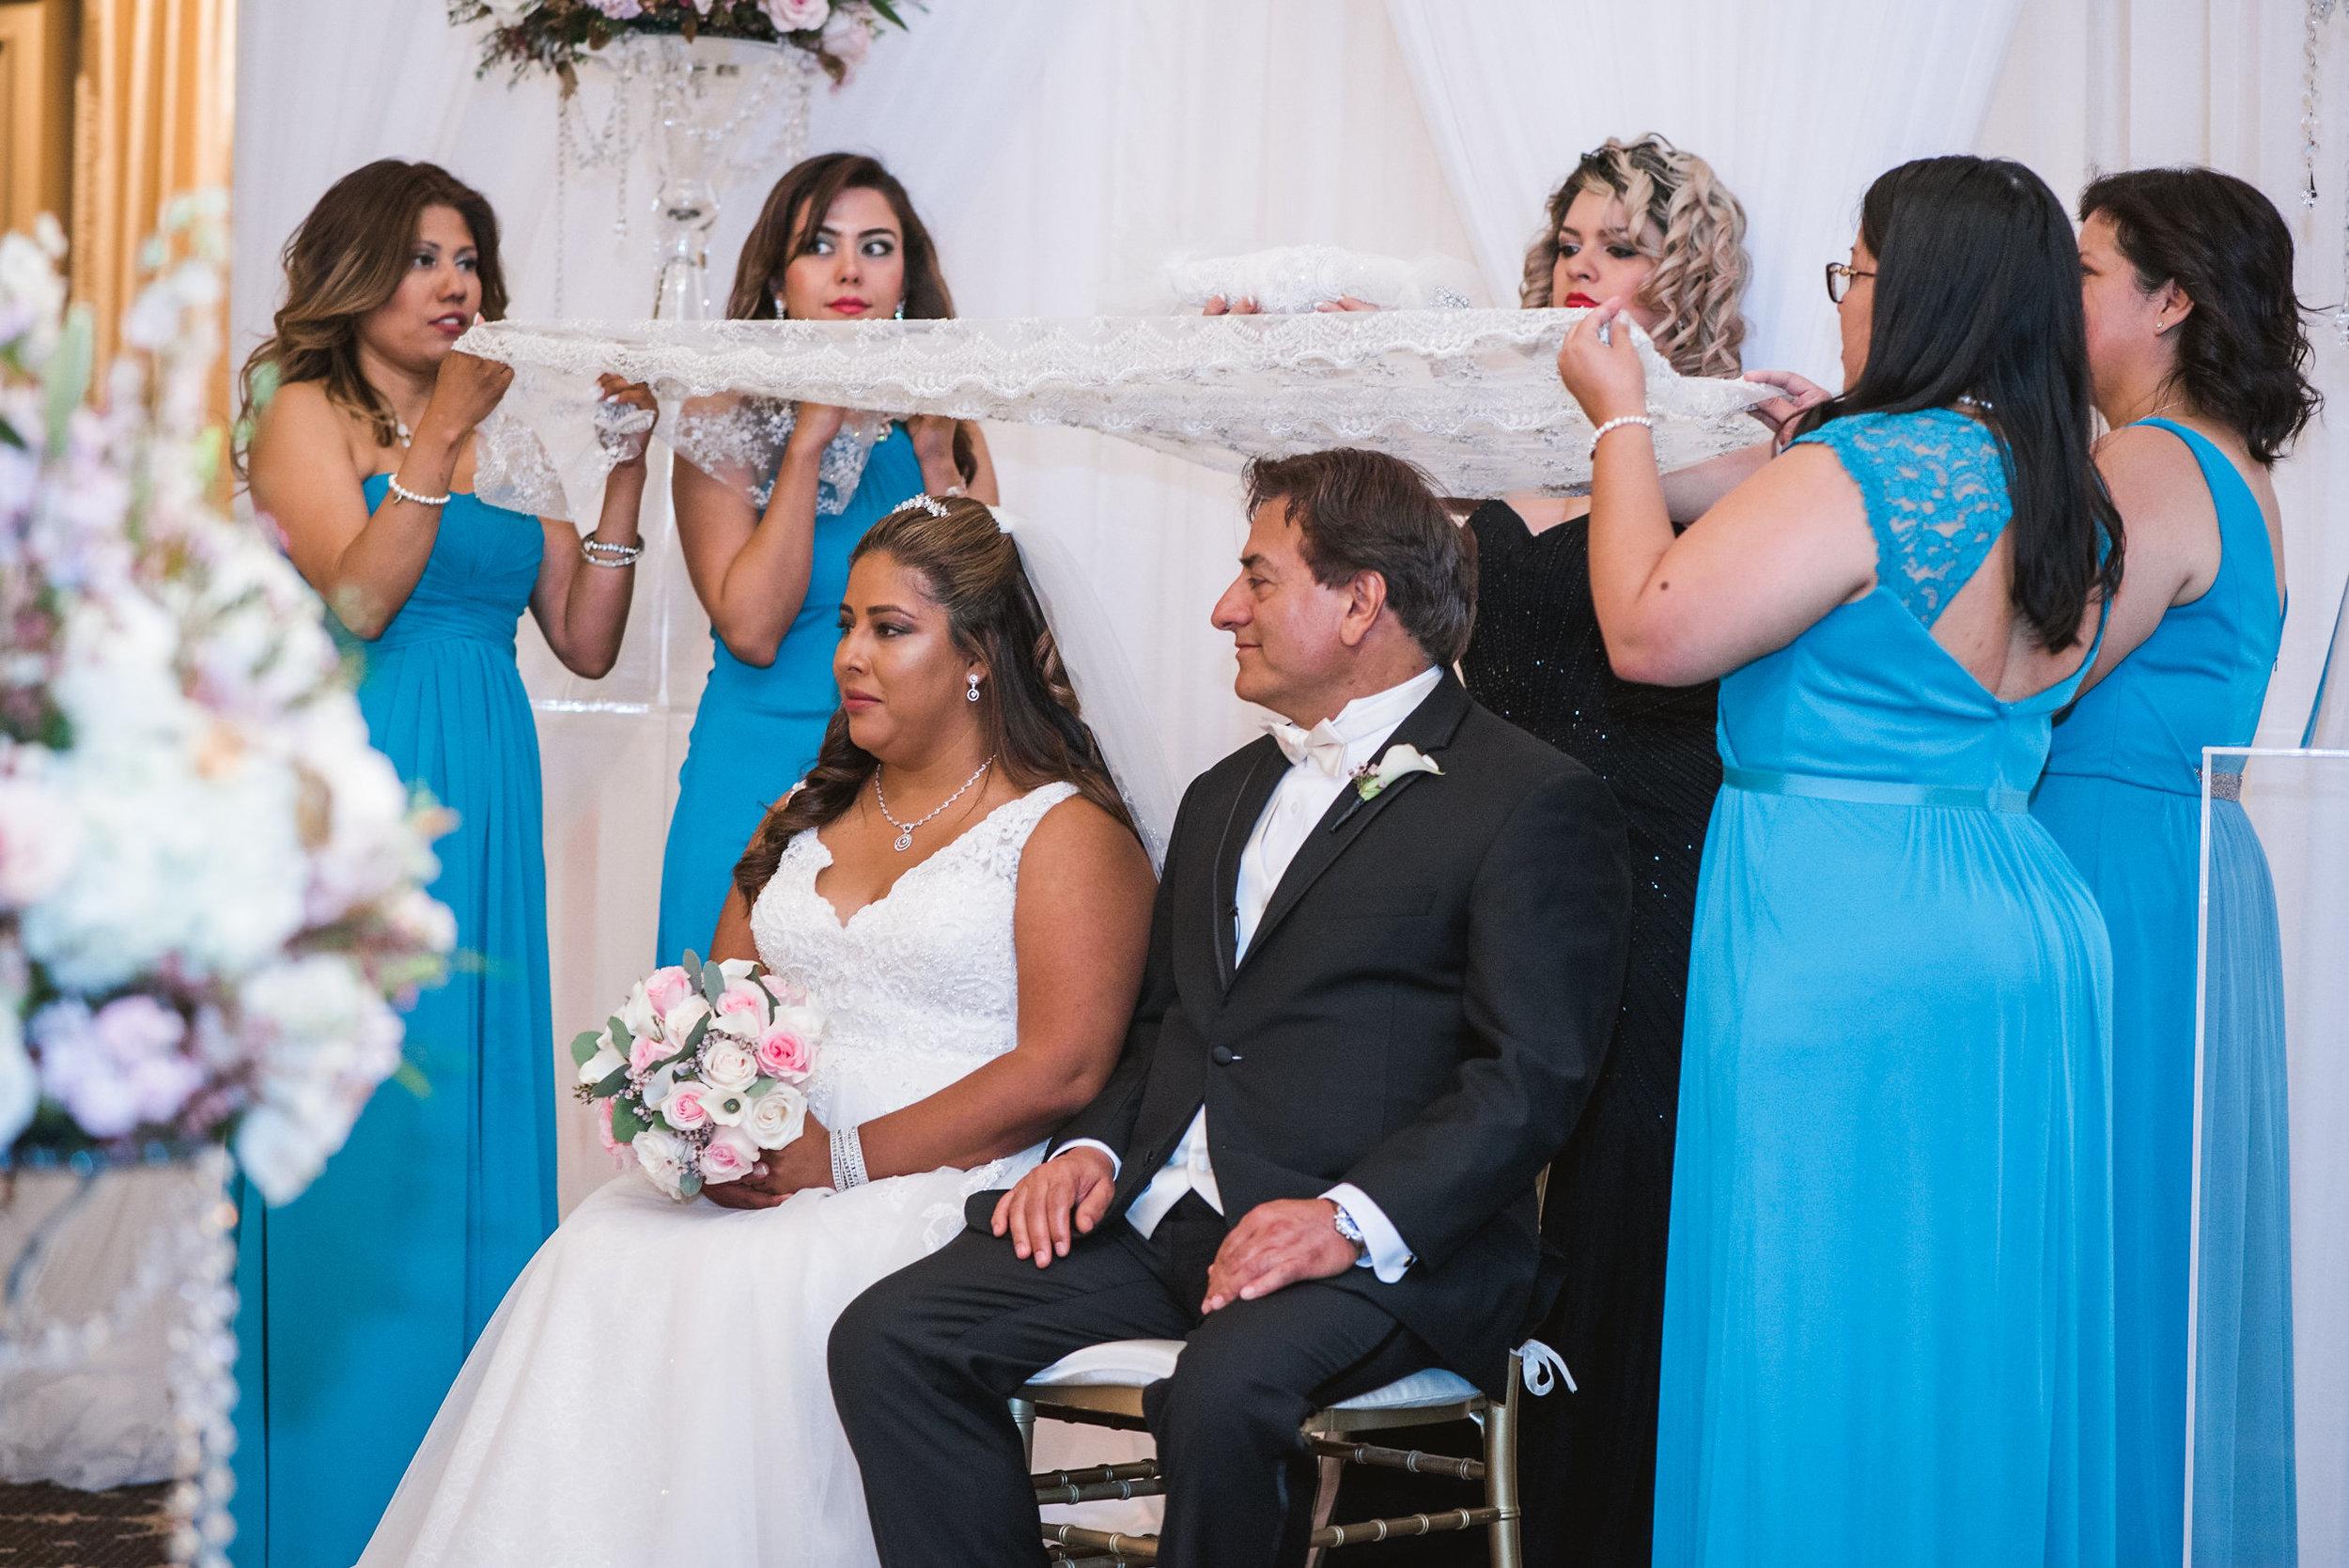 Wedding ceremony with bridesmaids